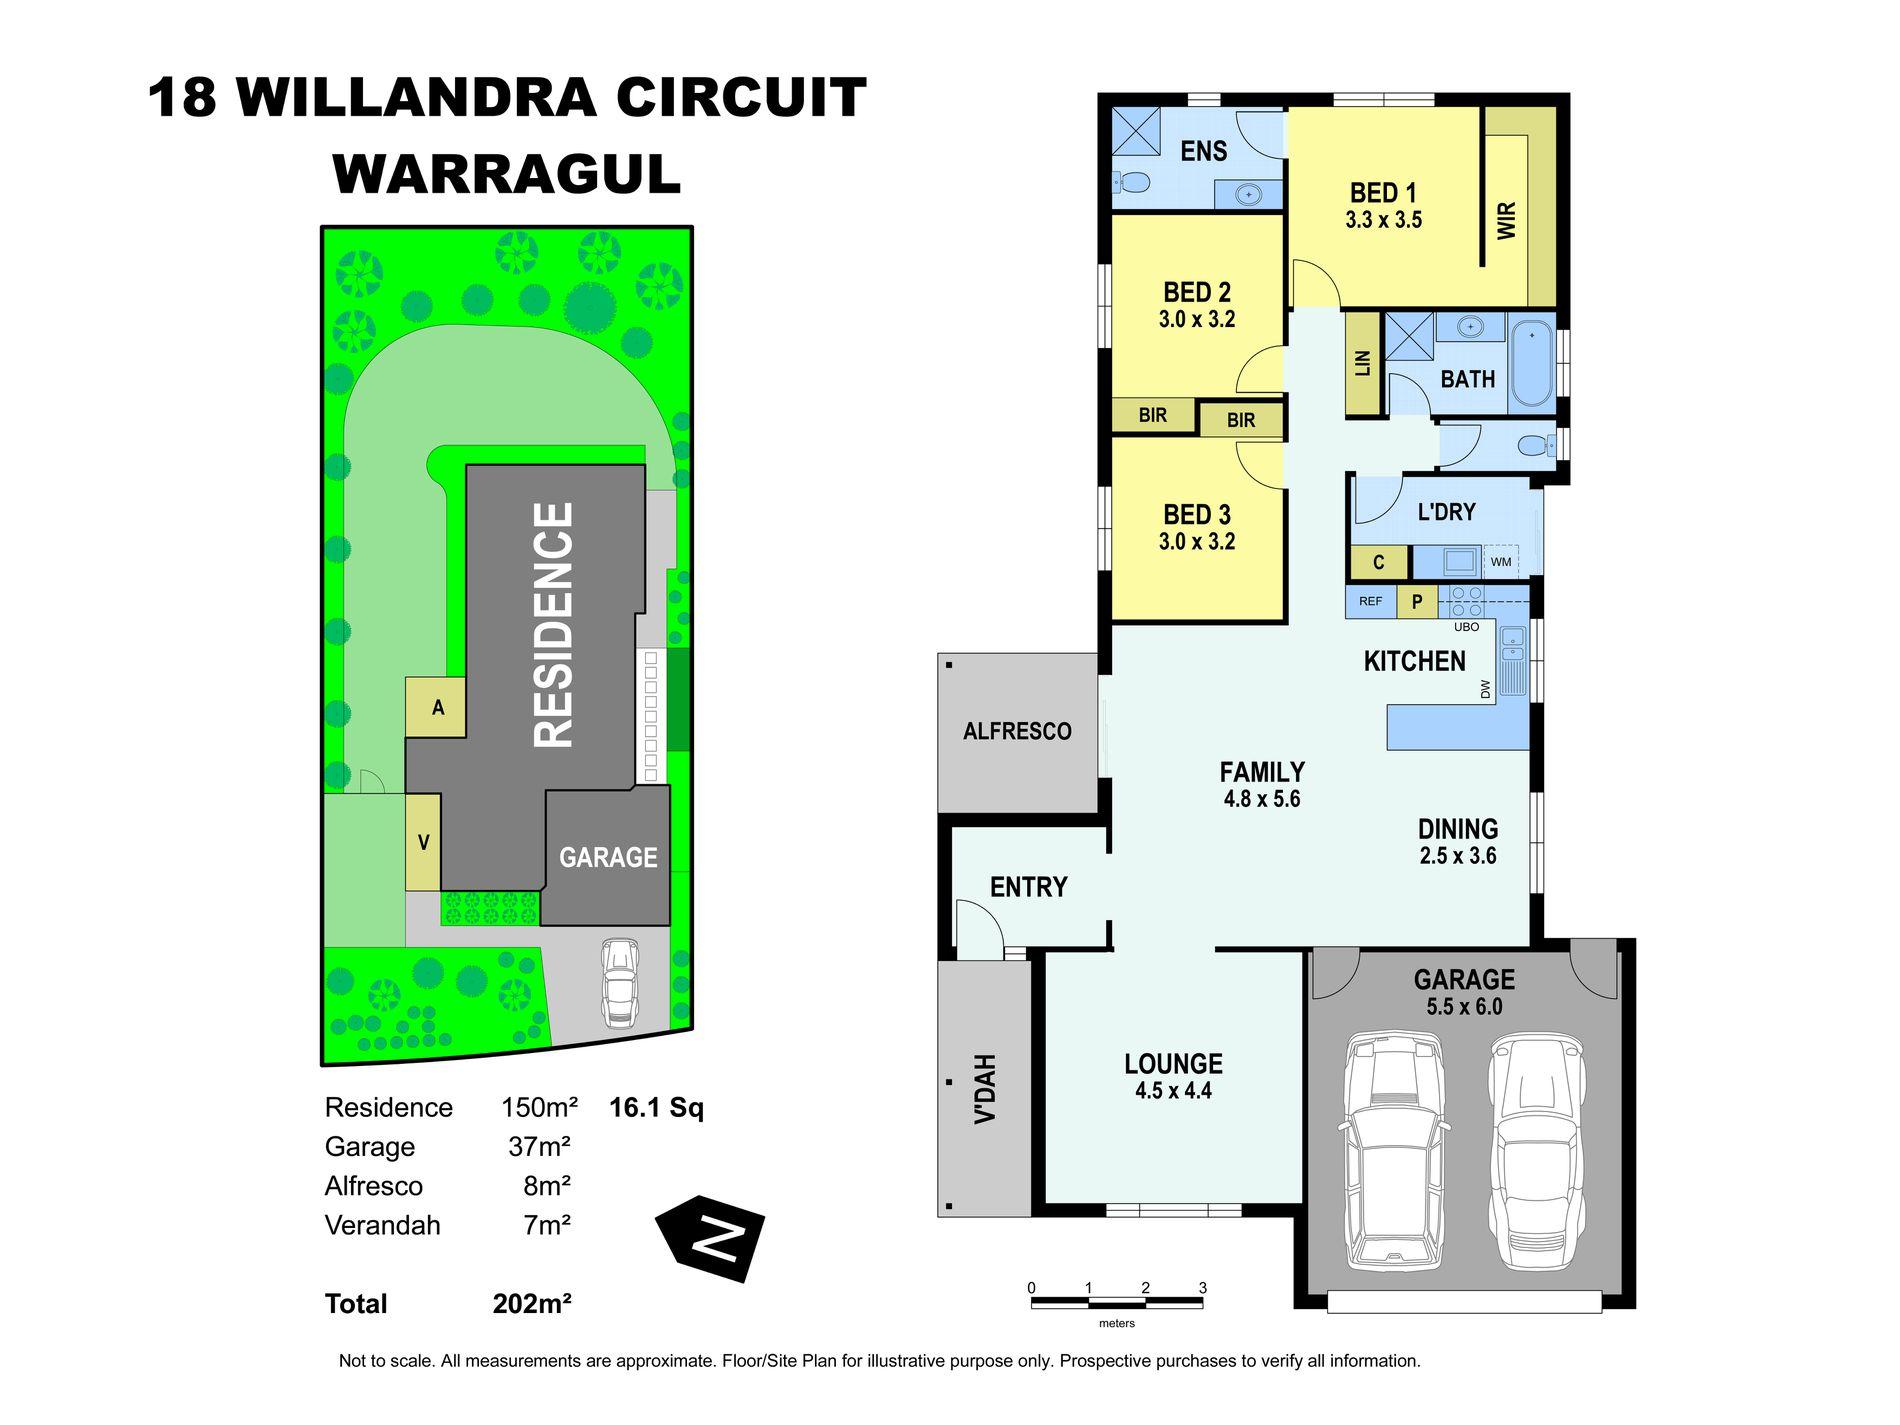 18 Willandra Circuit, Warragul